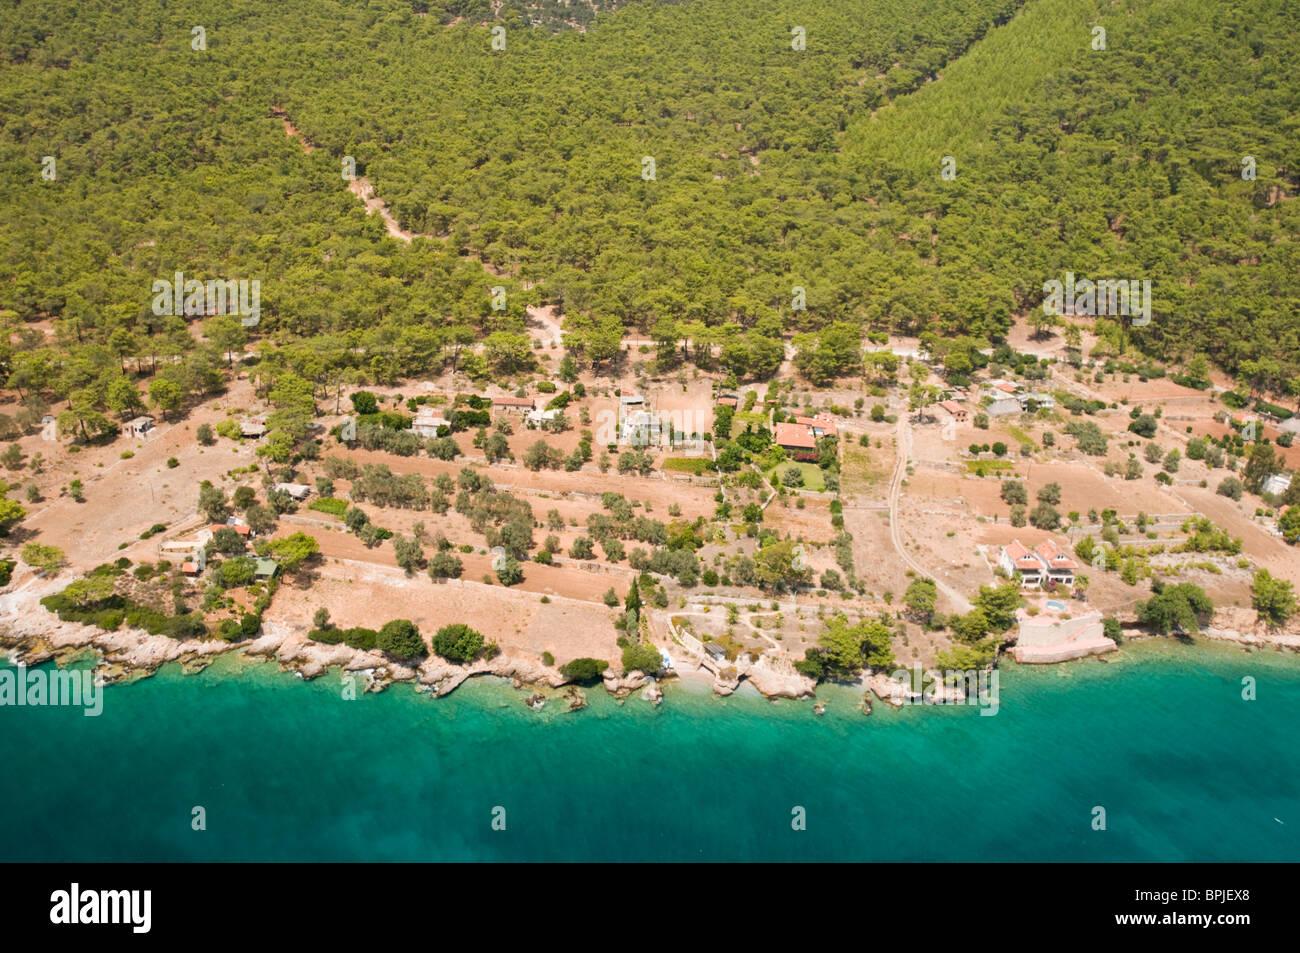 Aerial view of human impact on coastal forest cover Gokova Turkey - Stock Image